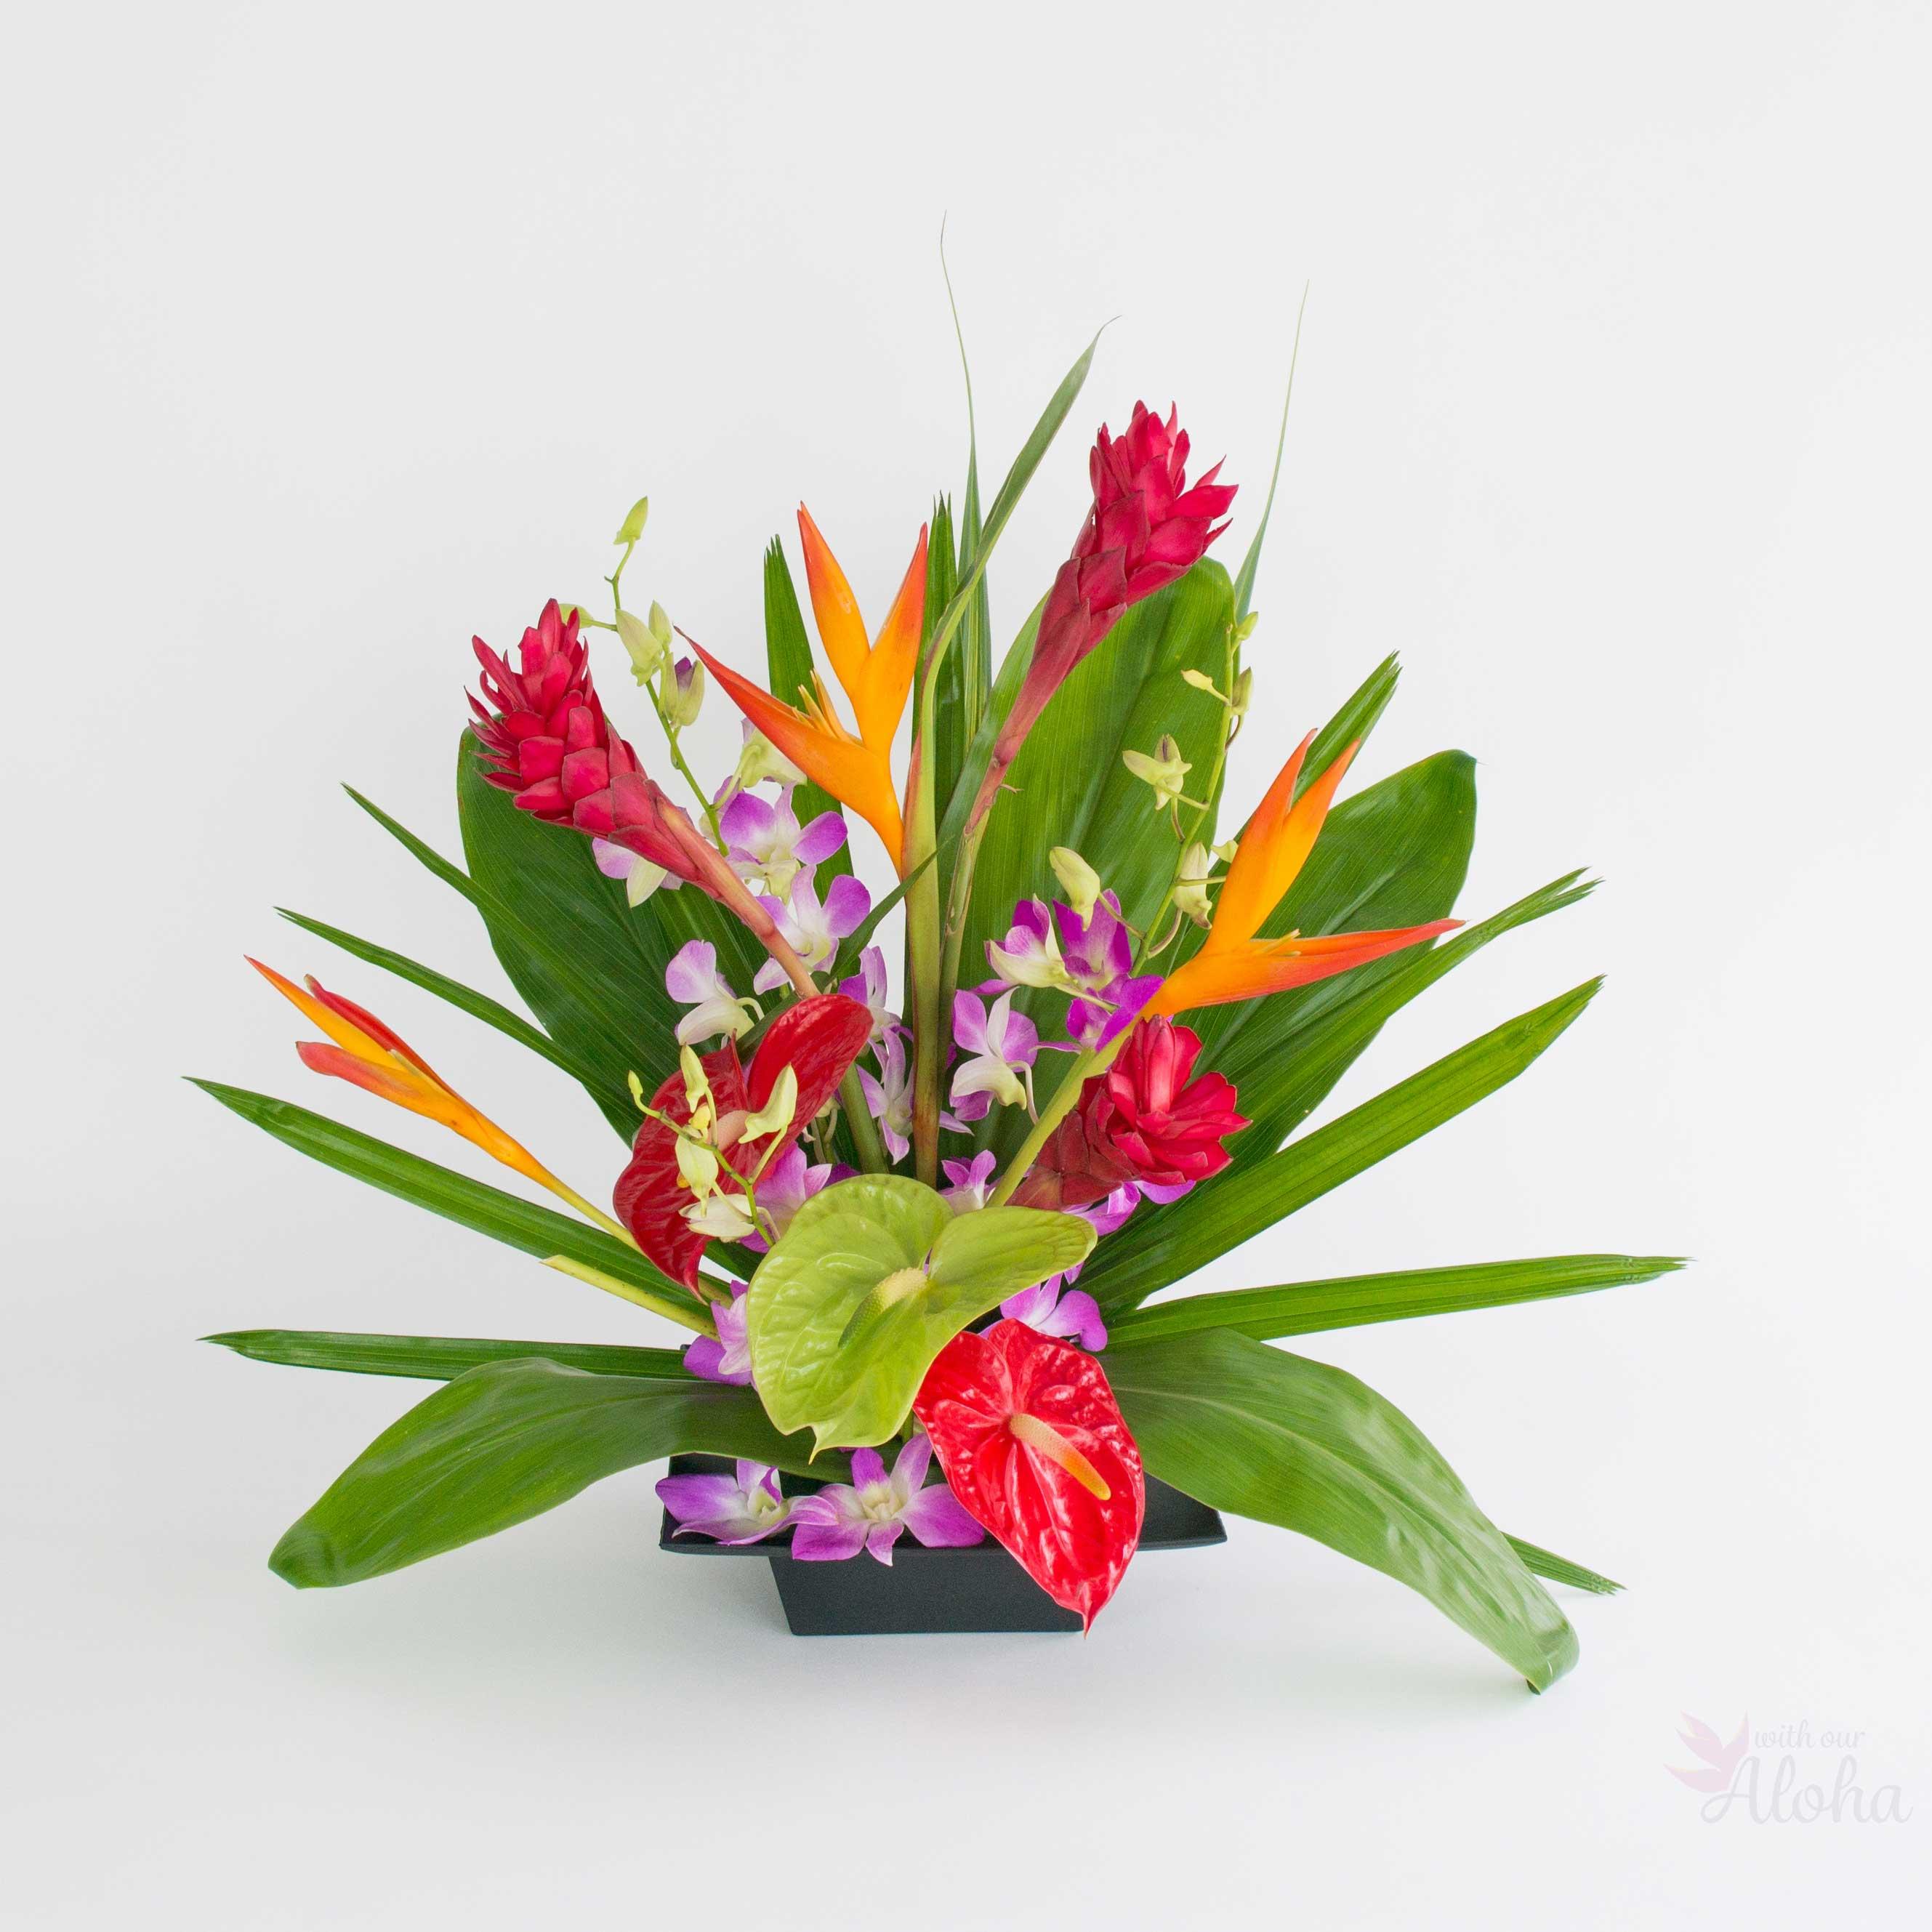 Hoaloha 39 good friend 39 flower assortments - Flowers that mean friendship ...